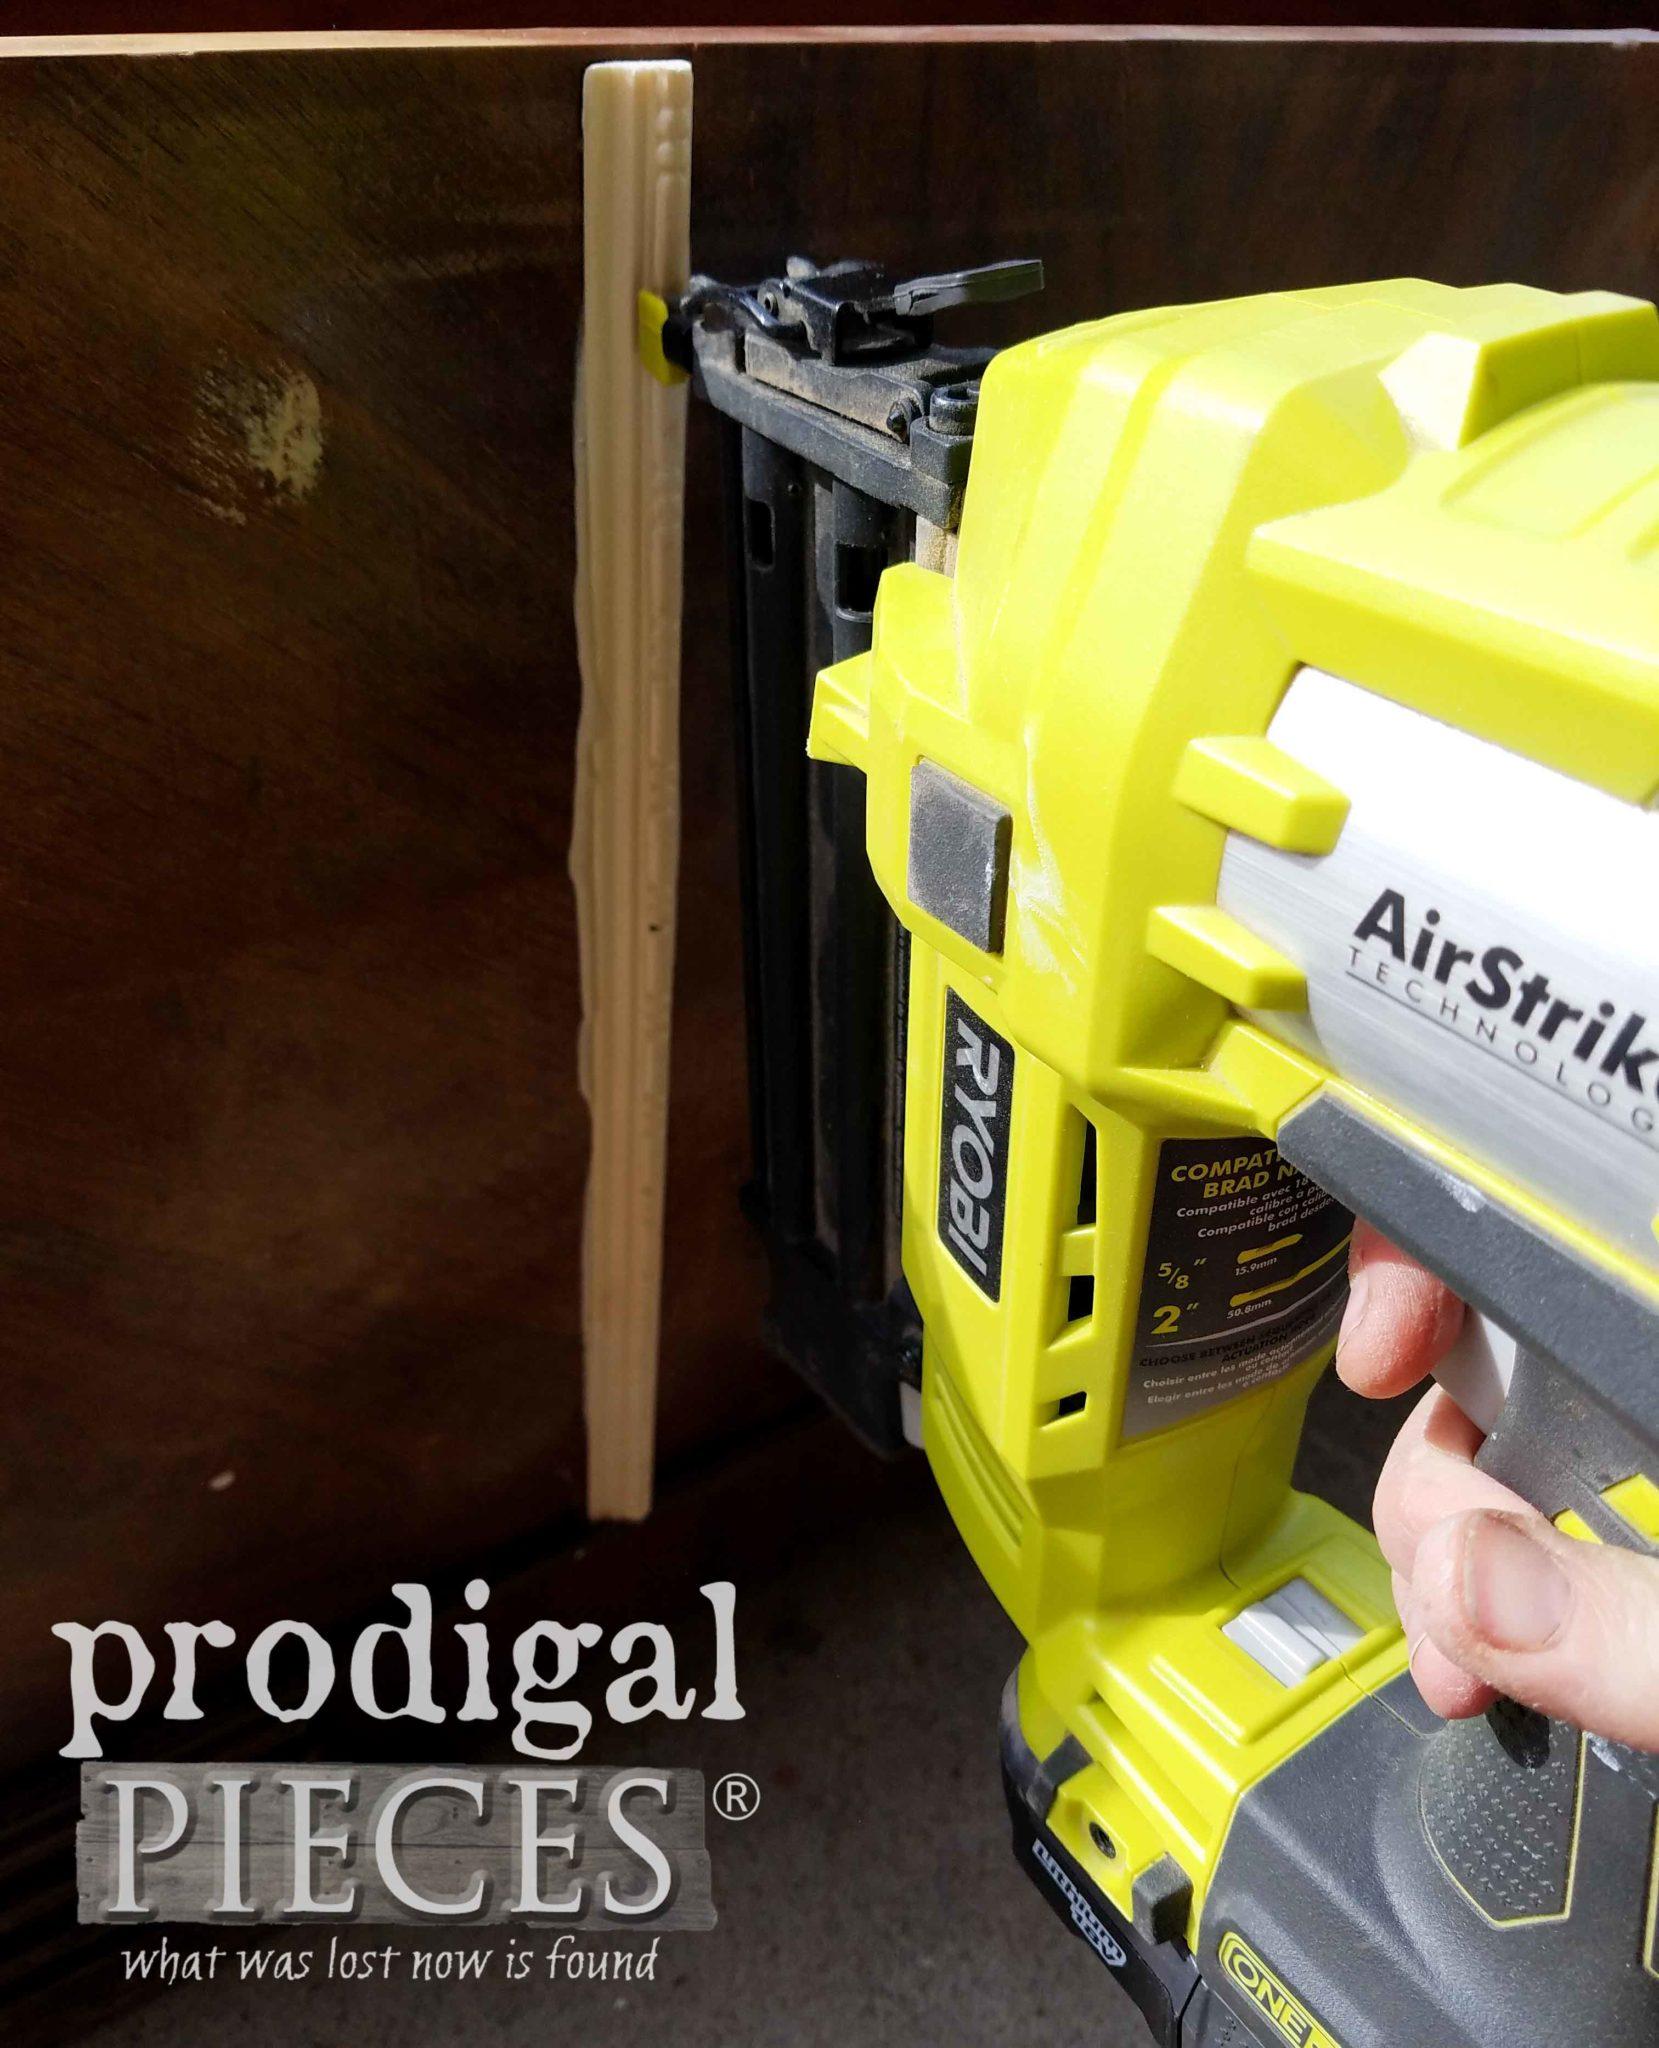 Ryobi AirStrike Brad Nailer for Hope Chest repairs | prodigalpieces.com